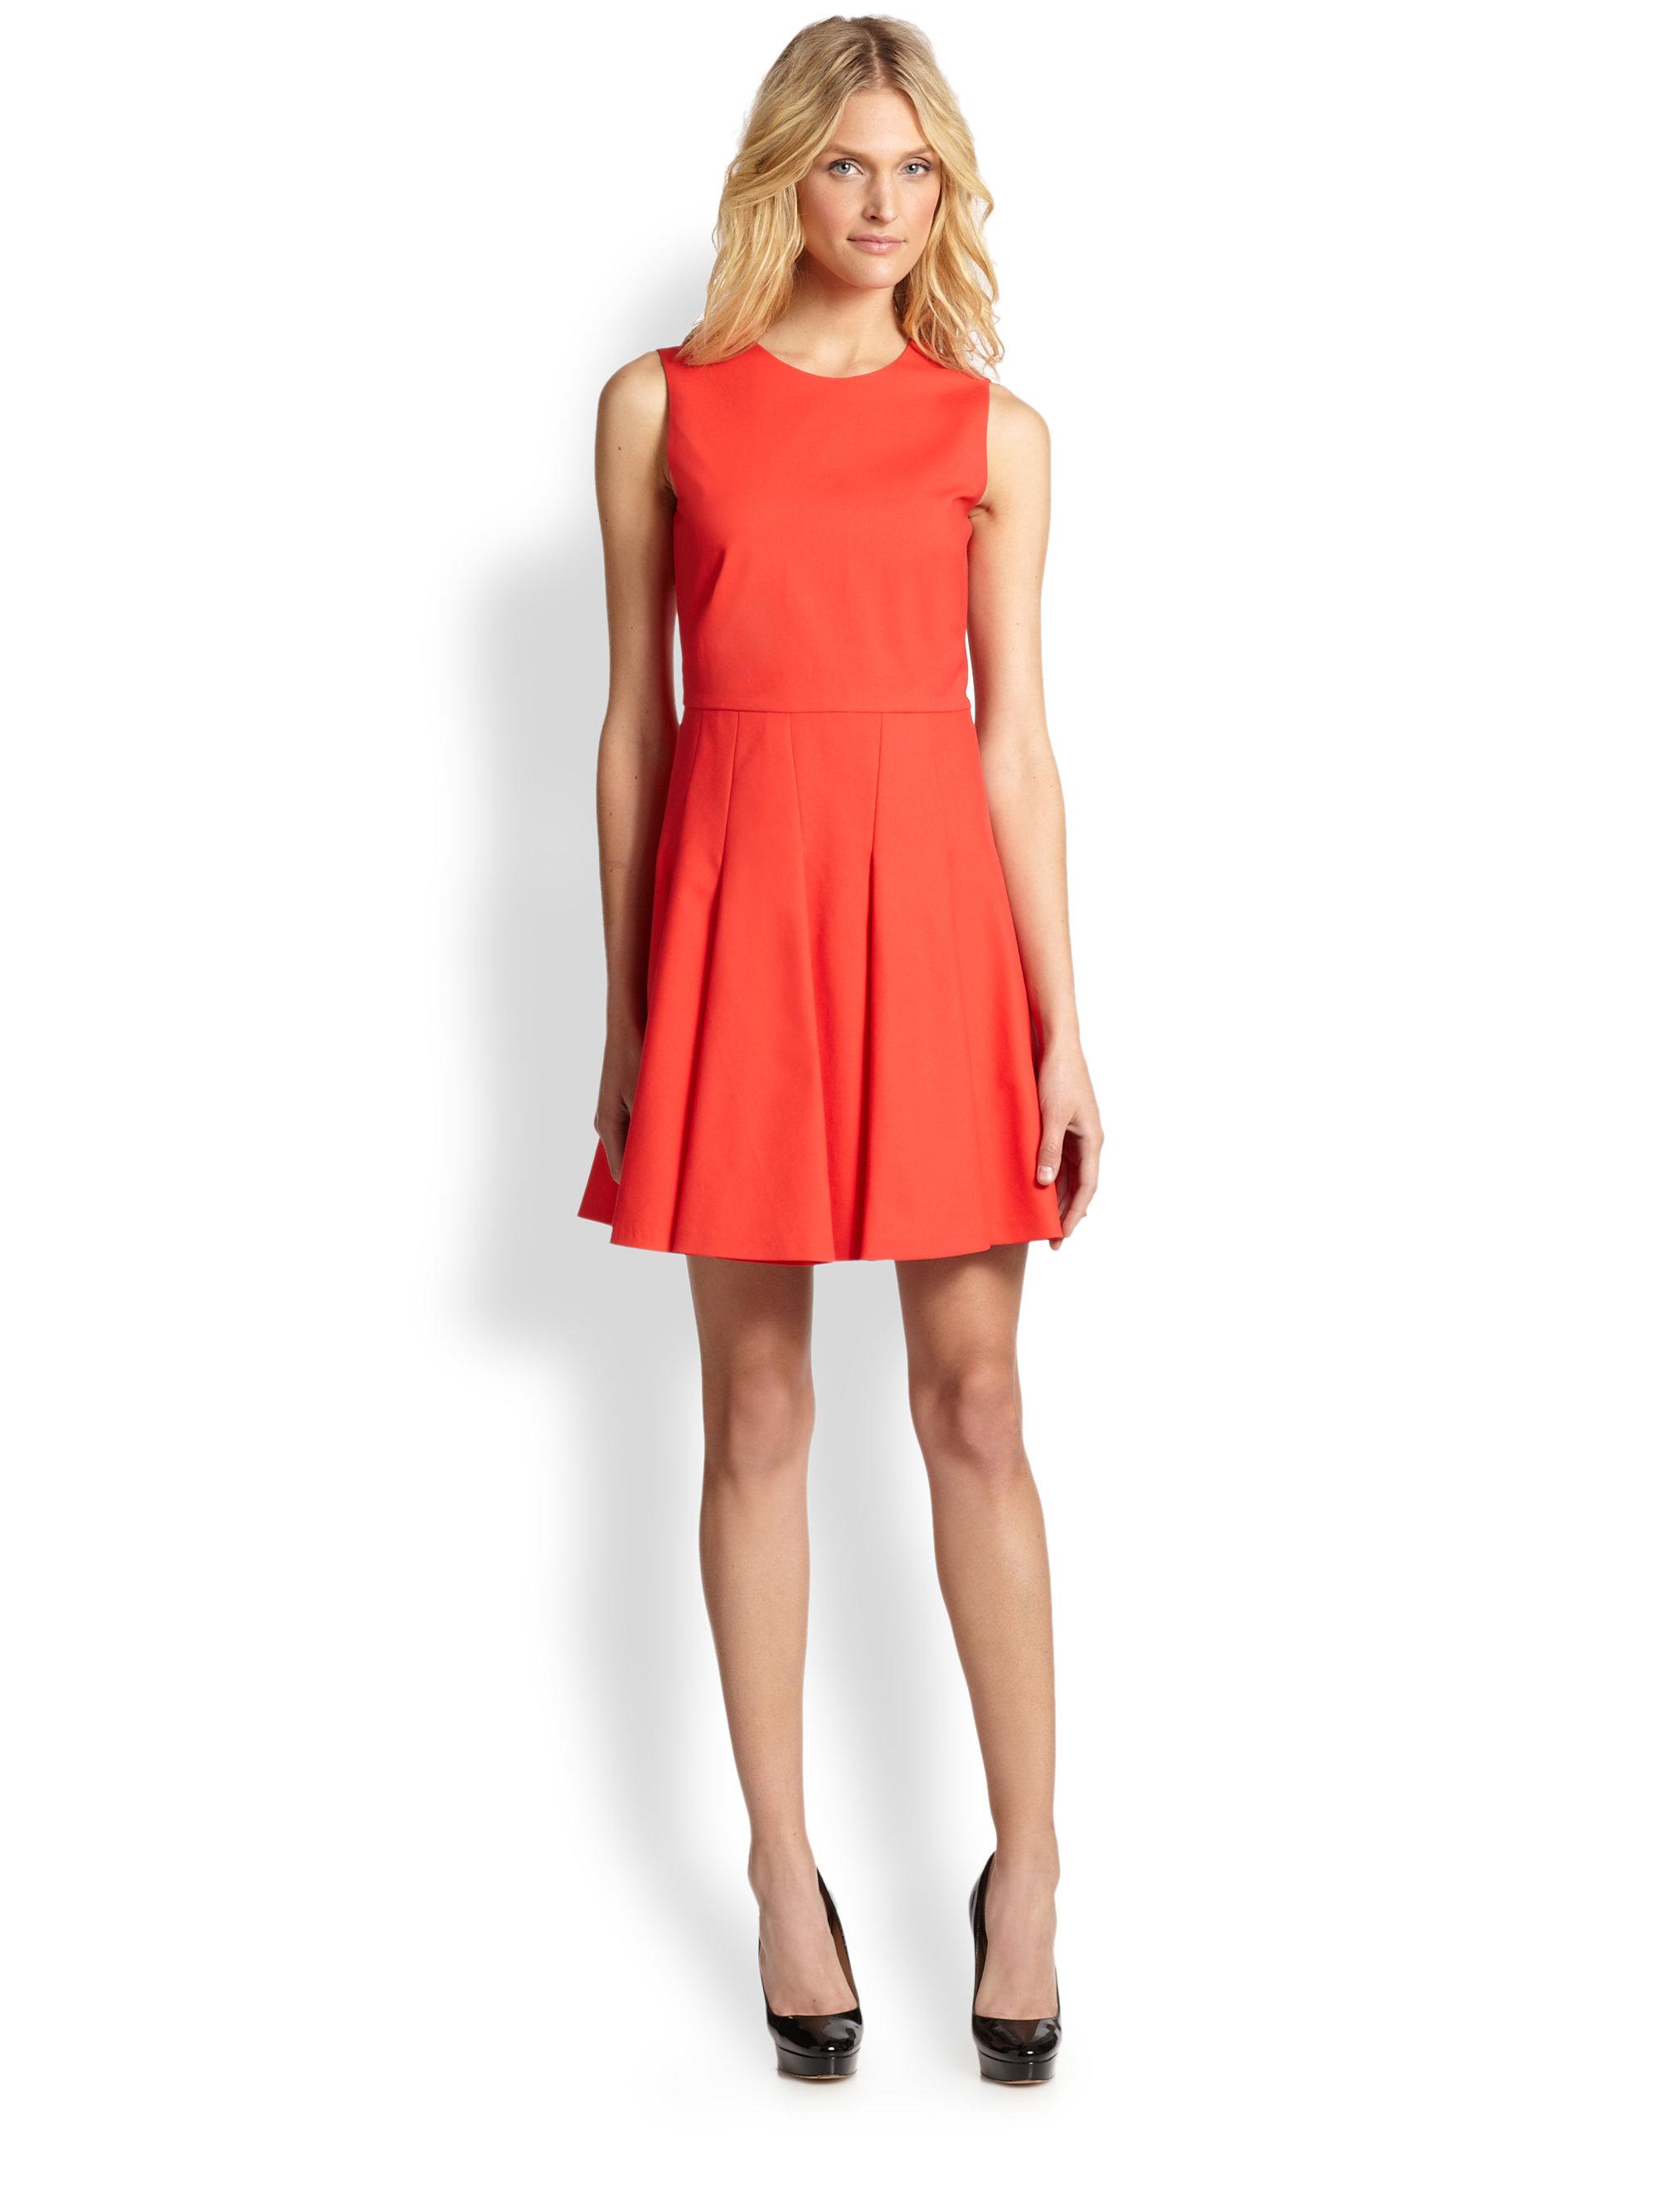 Red Valentino Stretch Cotton Fit Amp Flare Dress In Orange